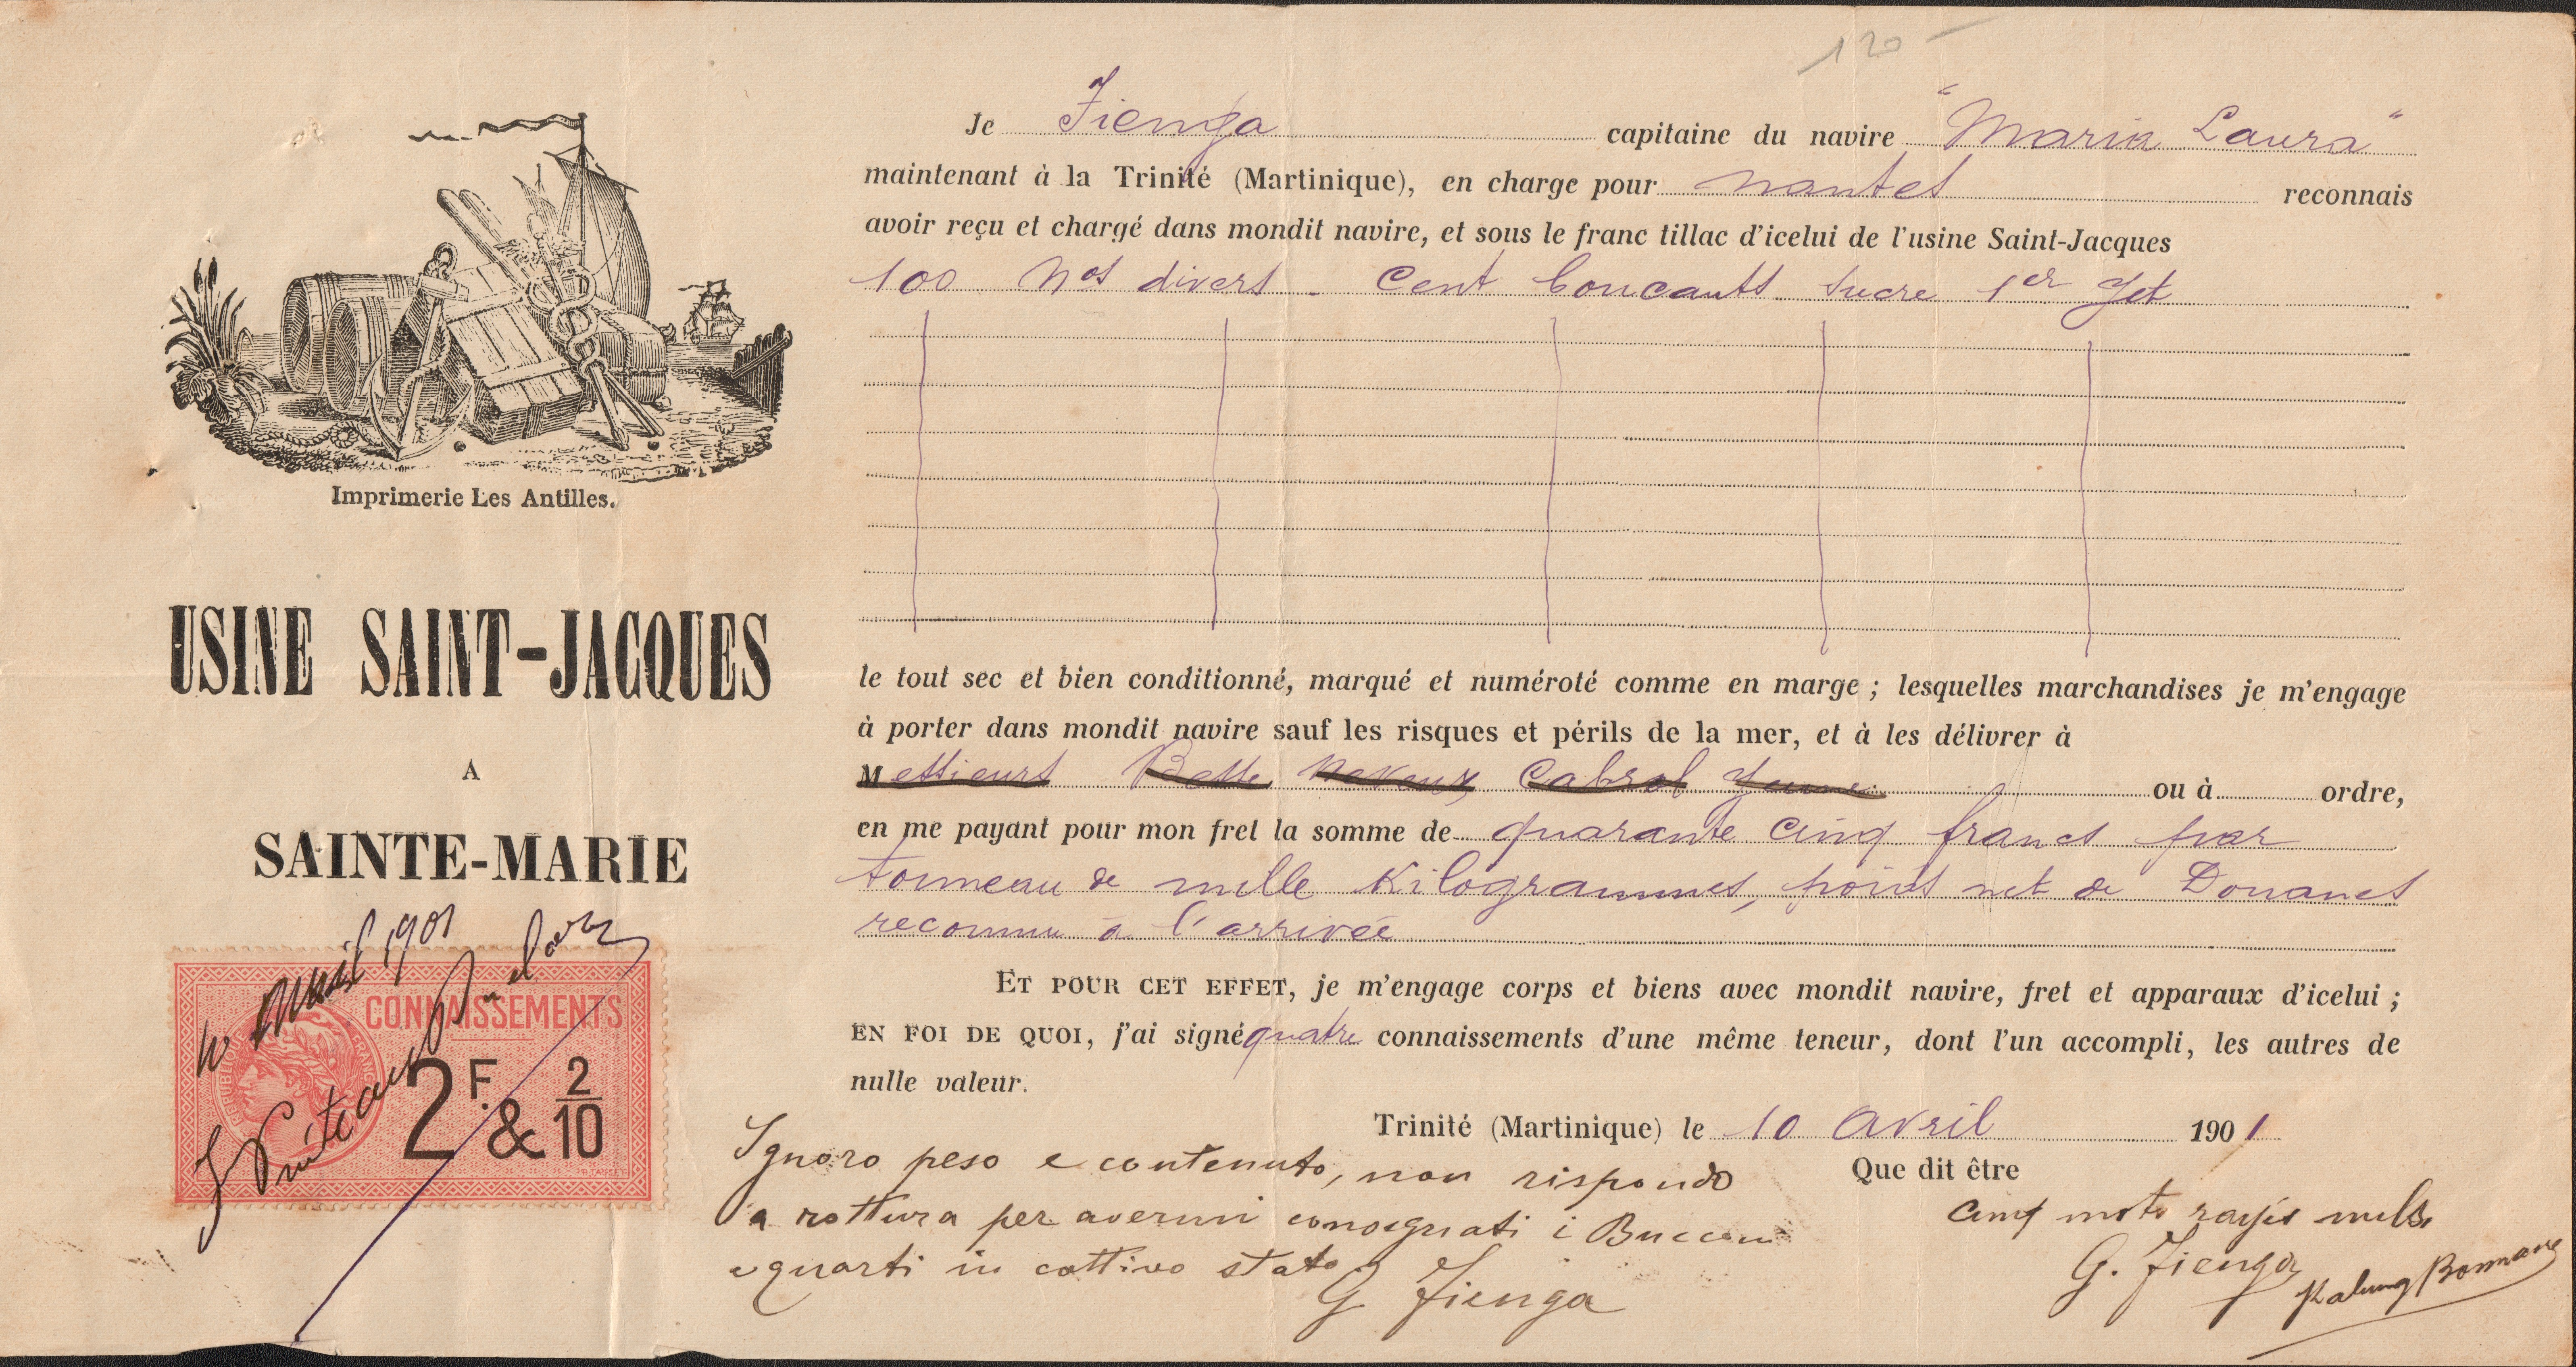 martinica nante 1901 10 04